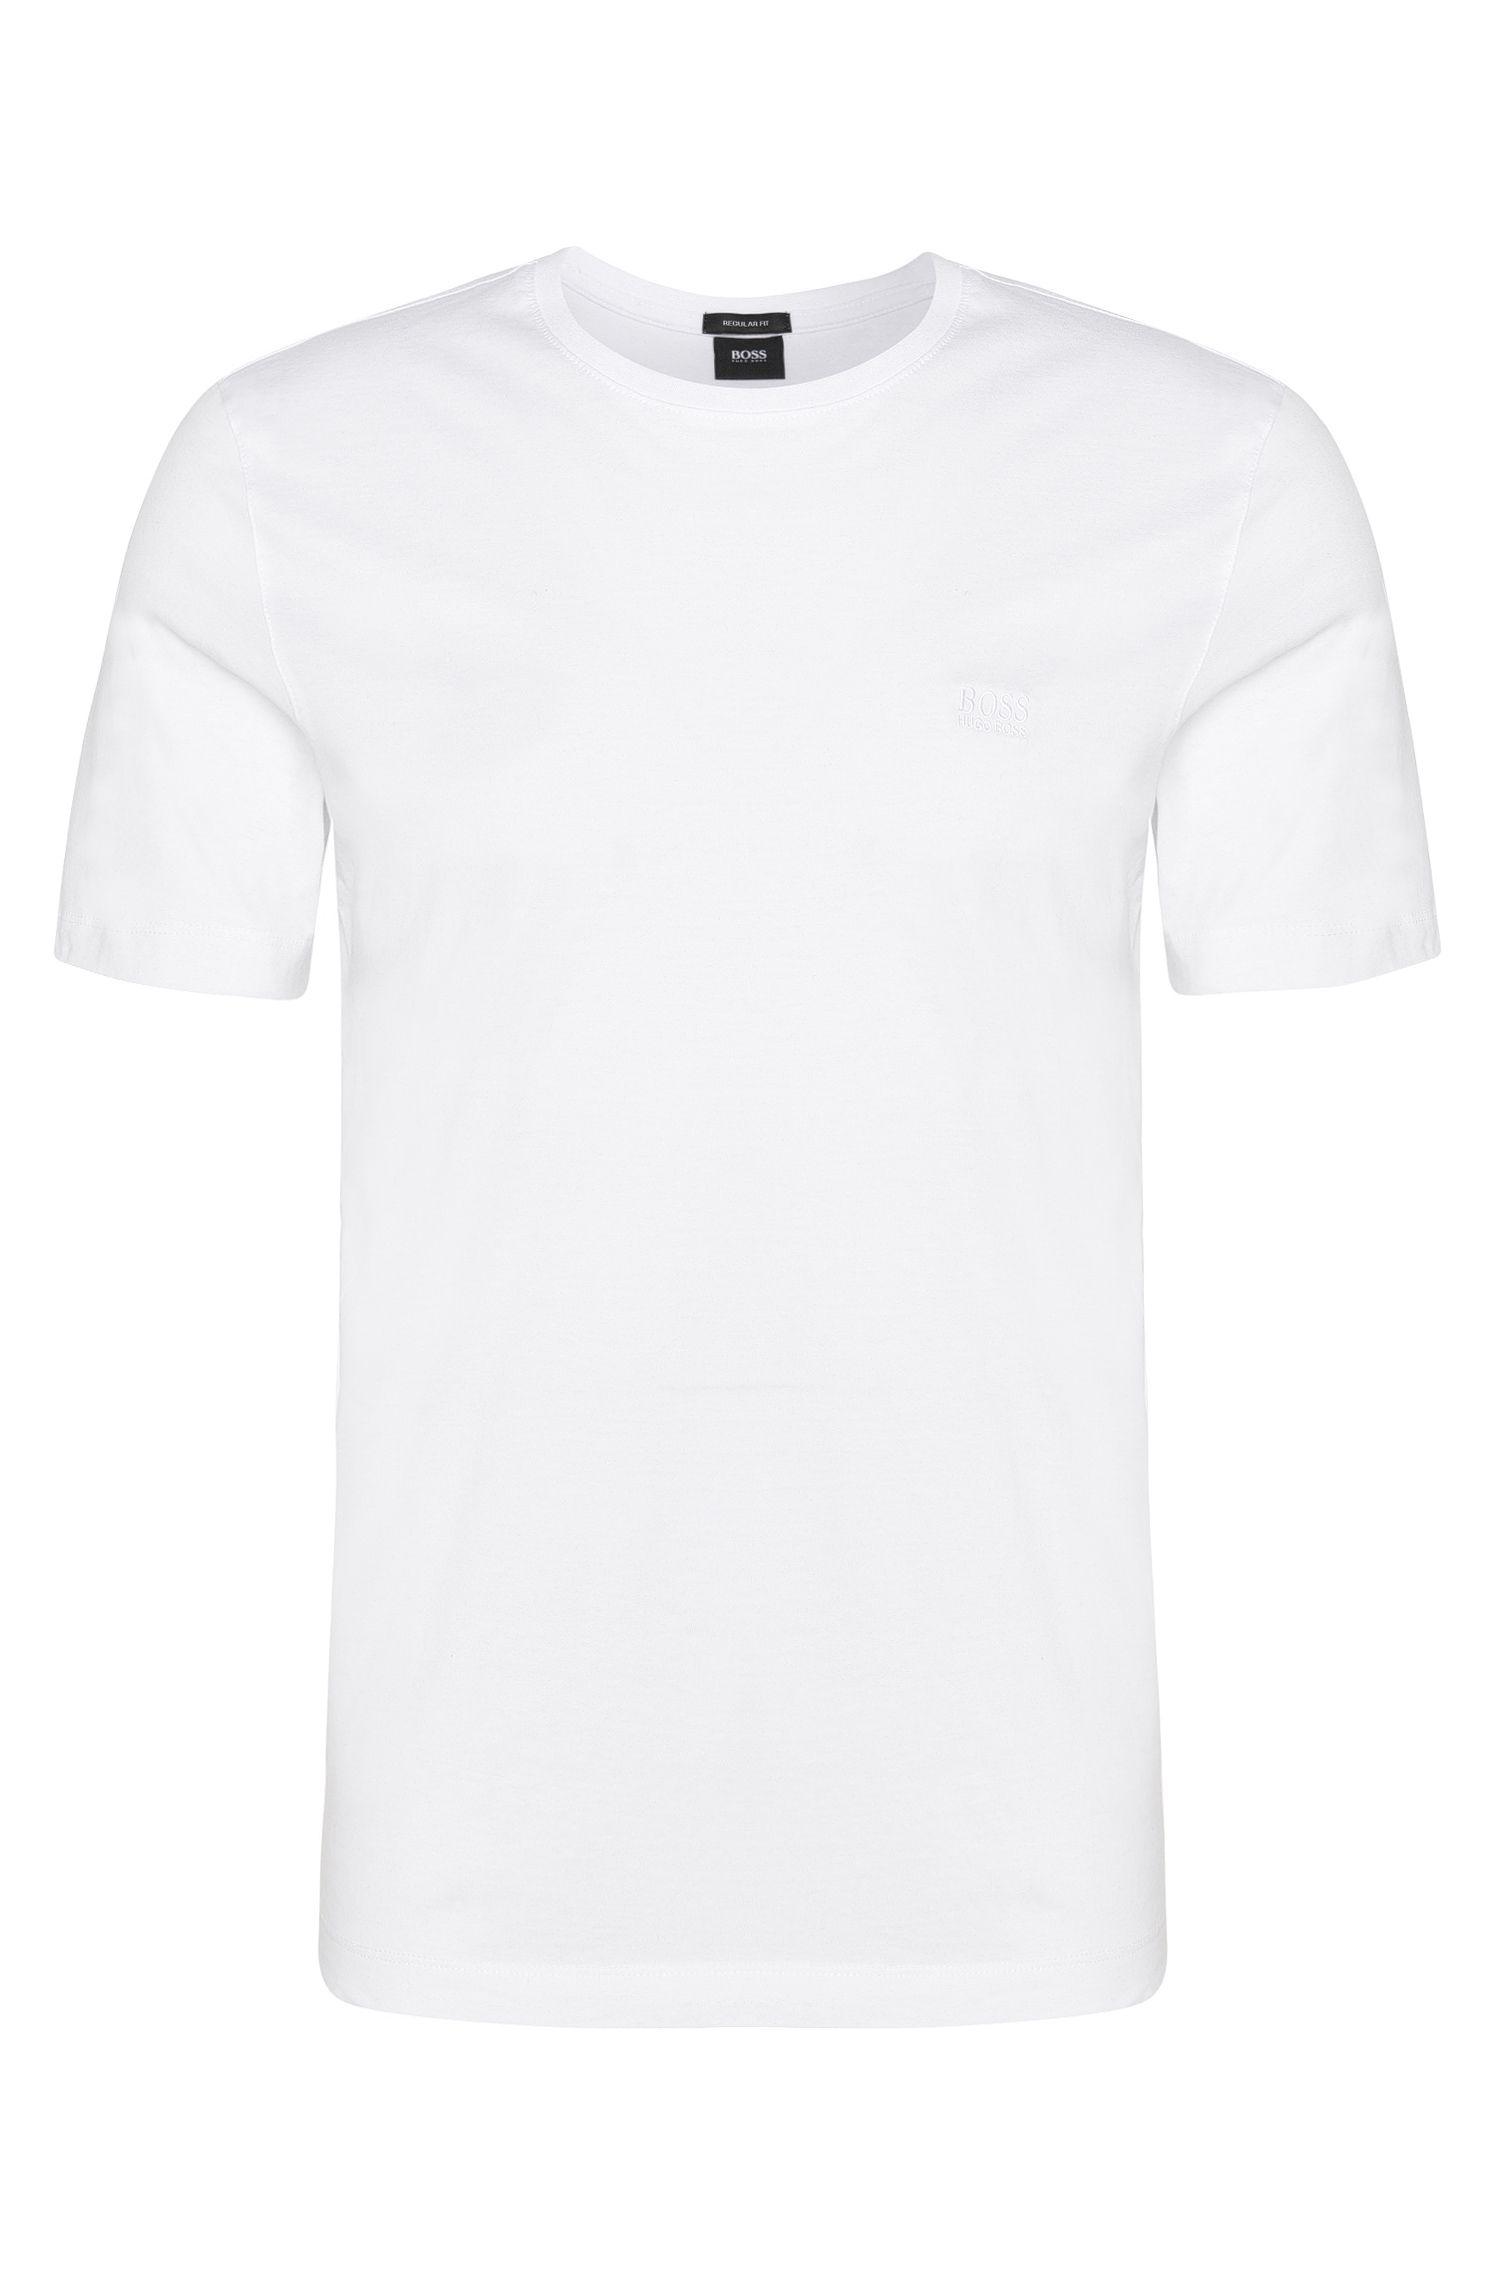 Doppelpack Regular-Fit T-Shirt aus Baumwolle: 'Twins 01'